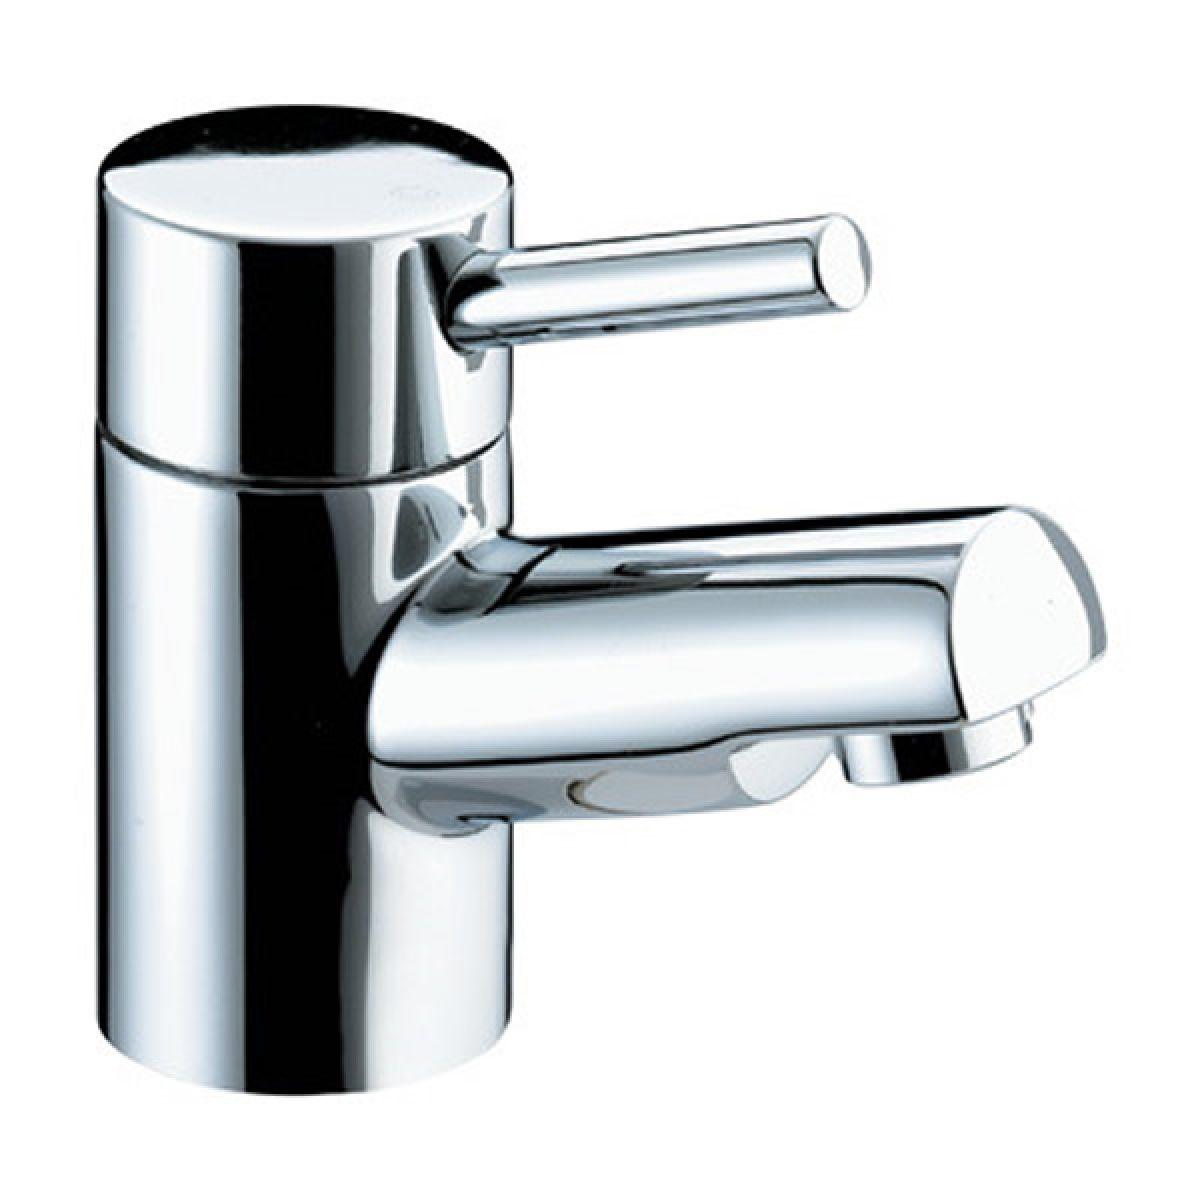 Bristan Prism One Hole Bath Filler : UK Bathrooms